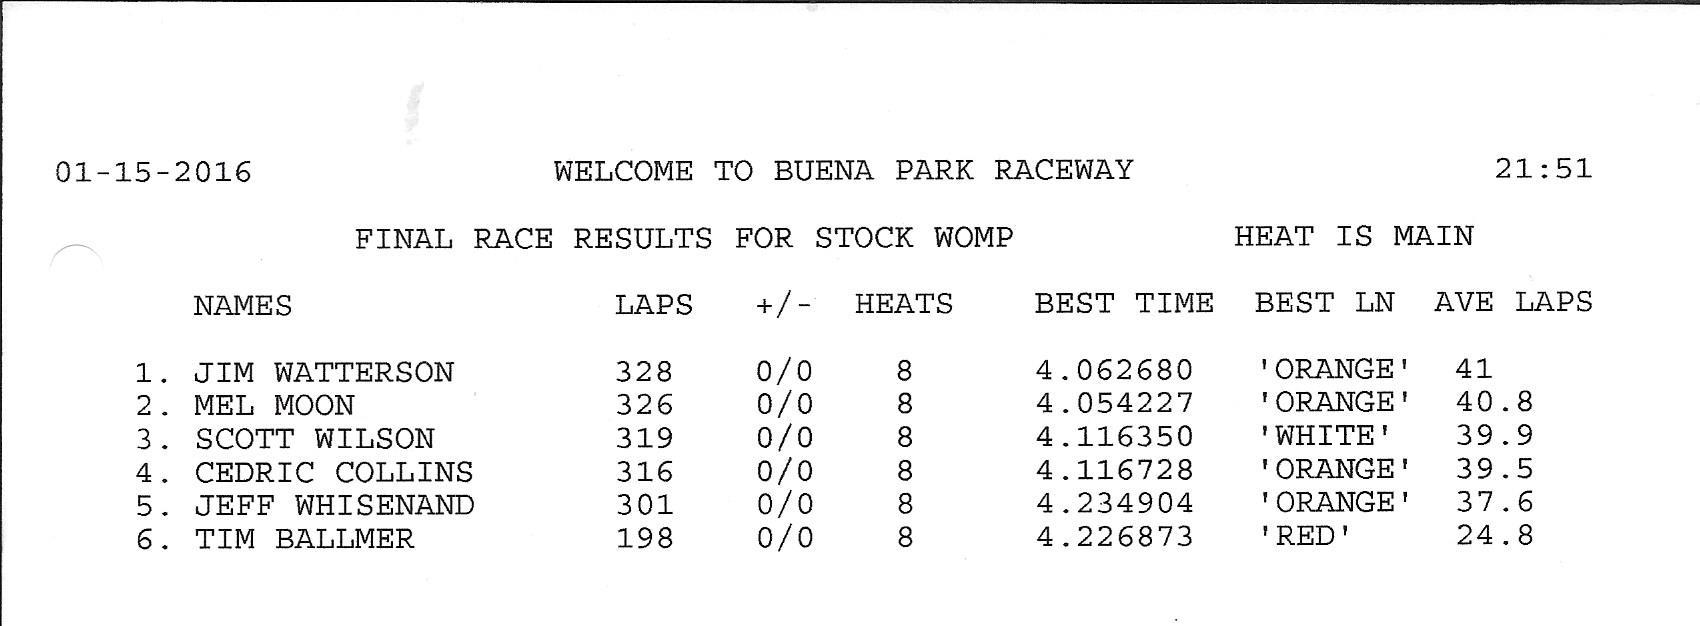 11516 womp results.jpg